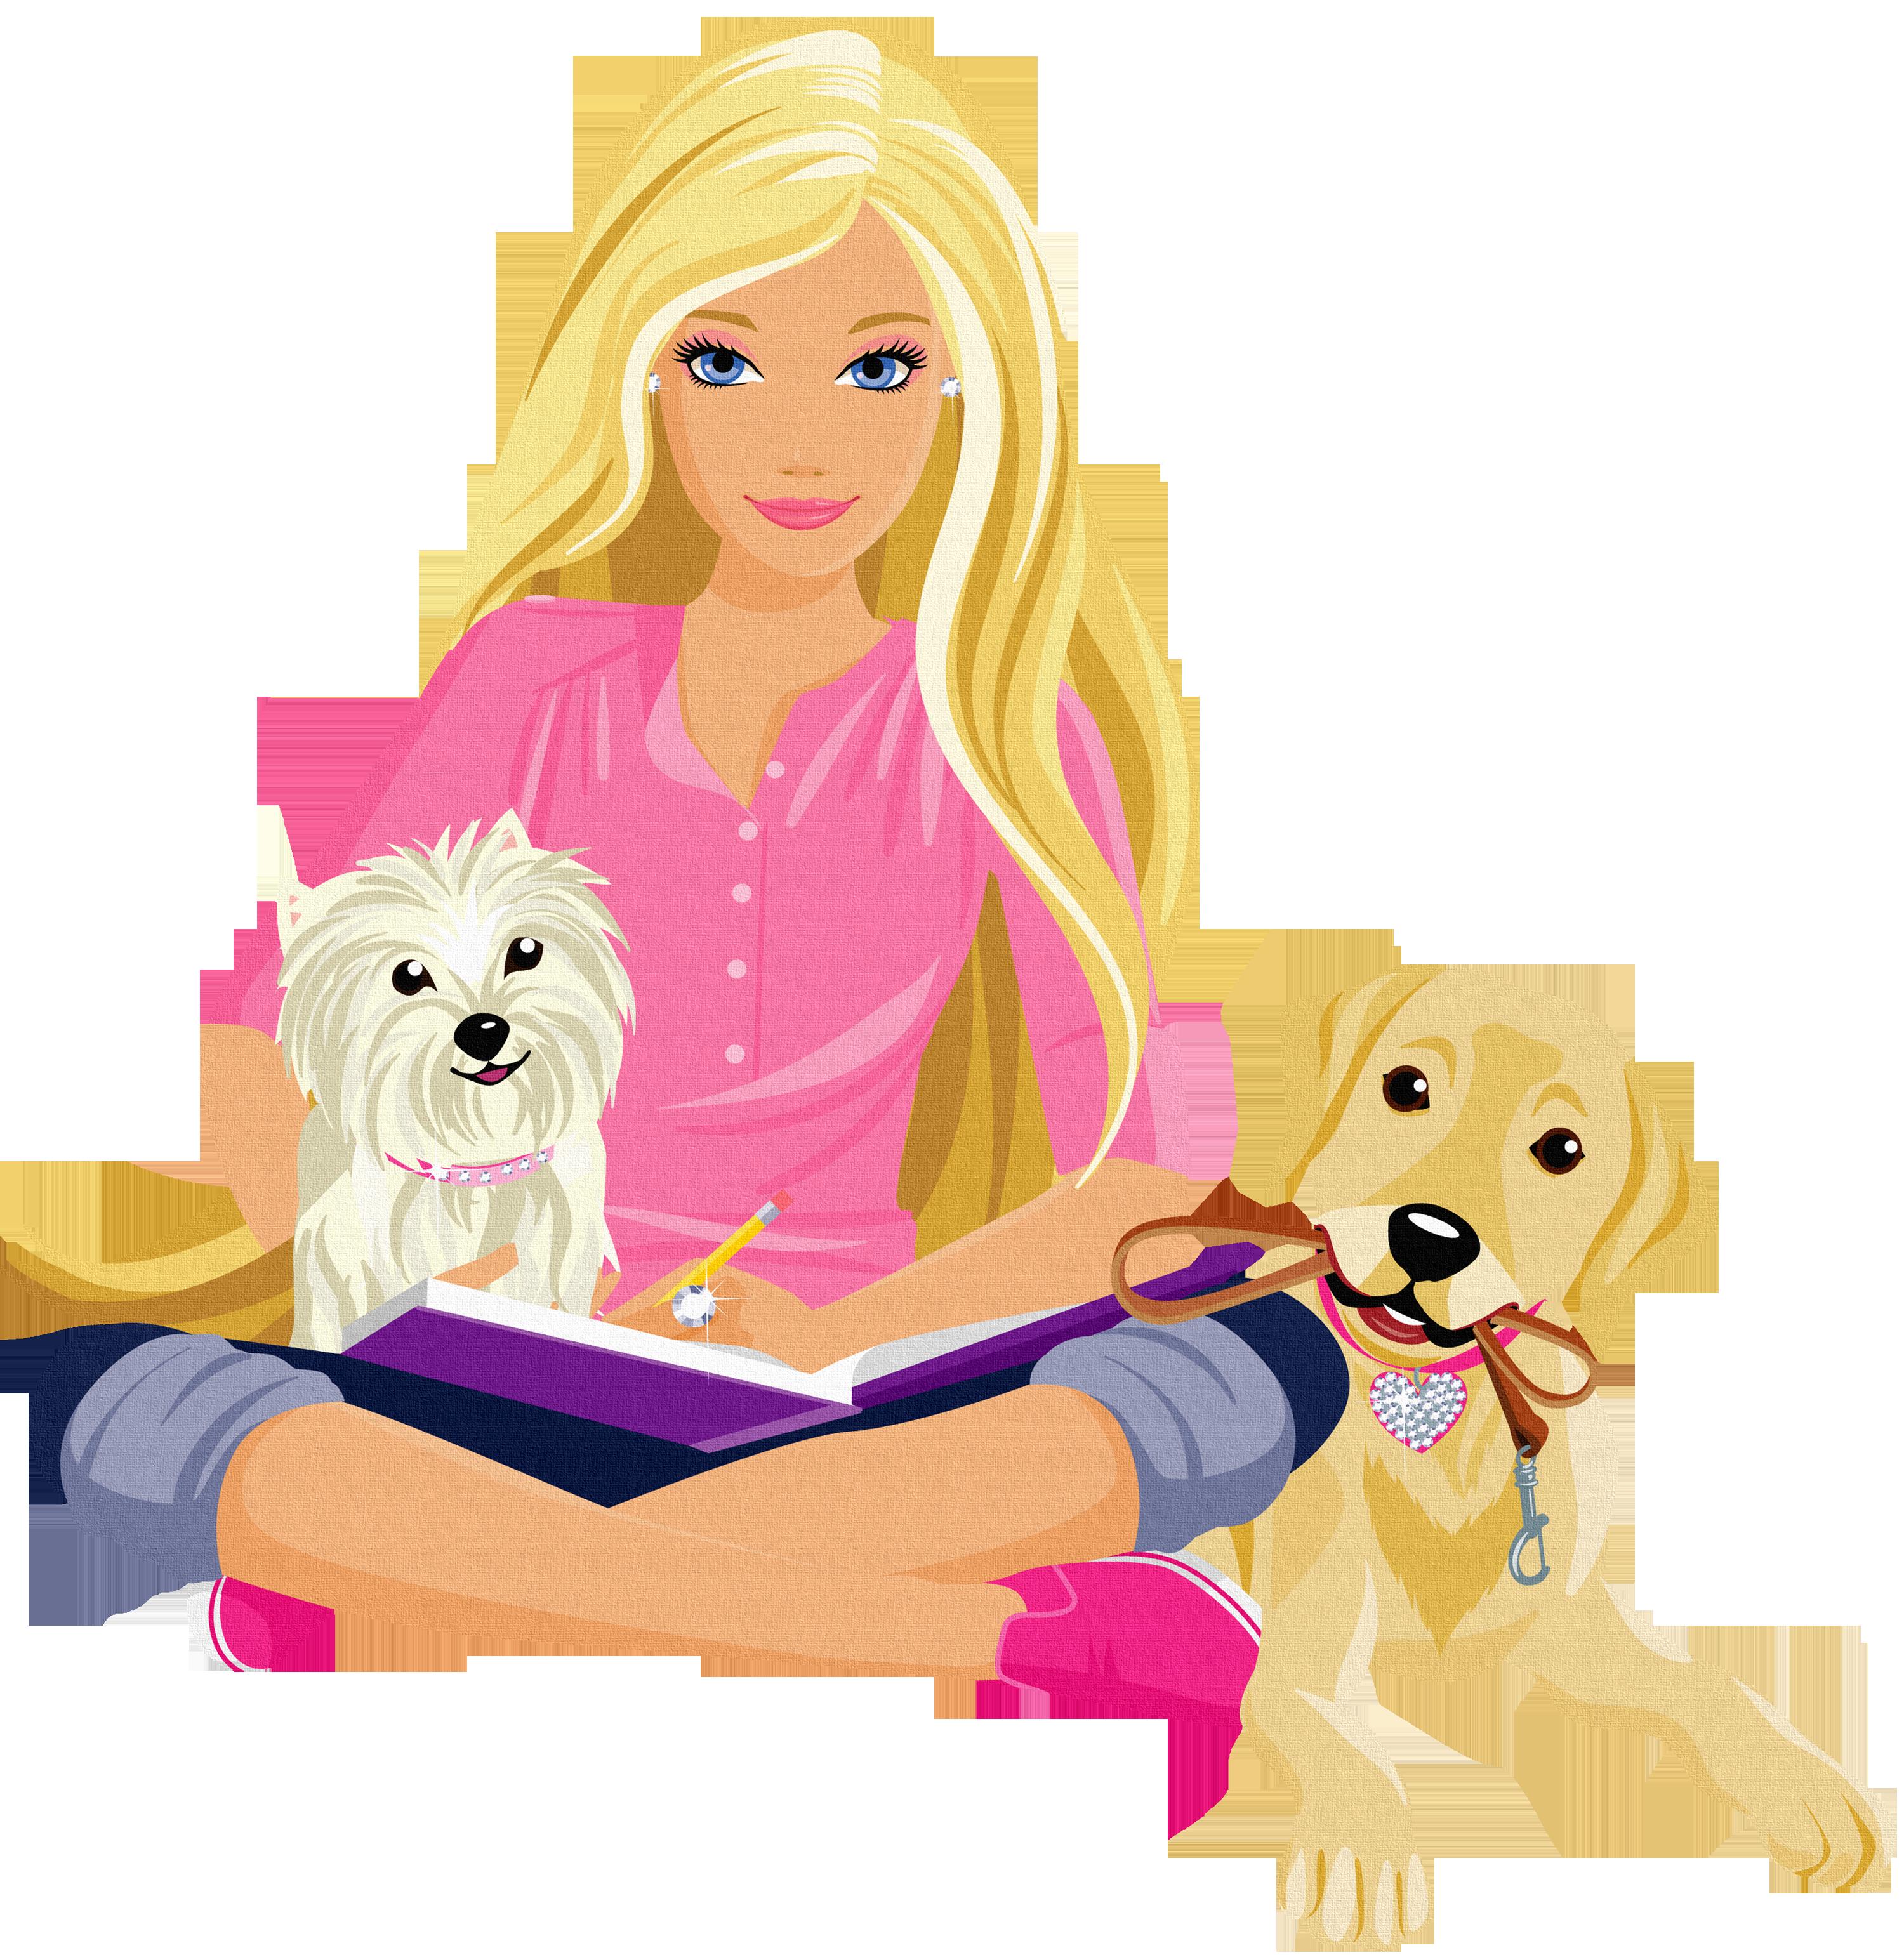 Barbie Free Clipart #1 - Barbie Clipart